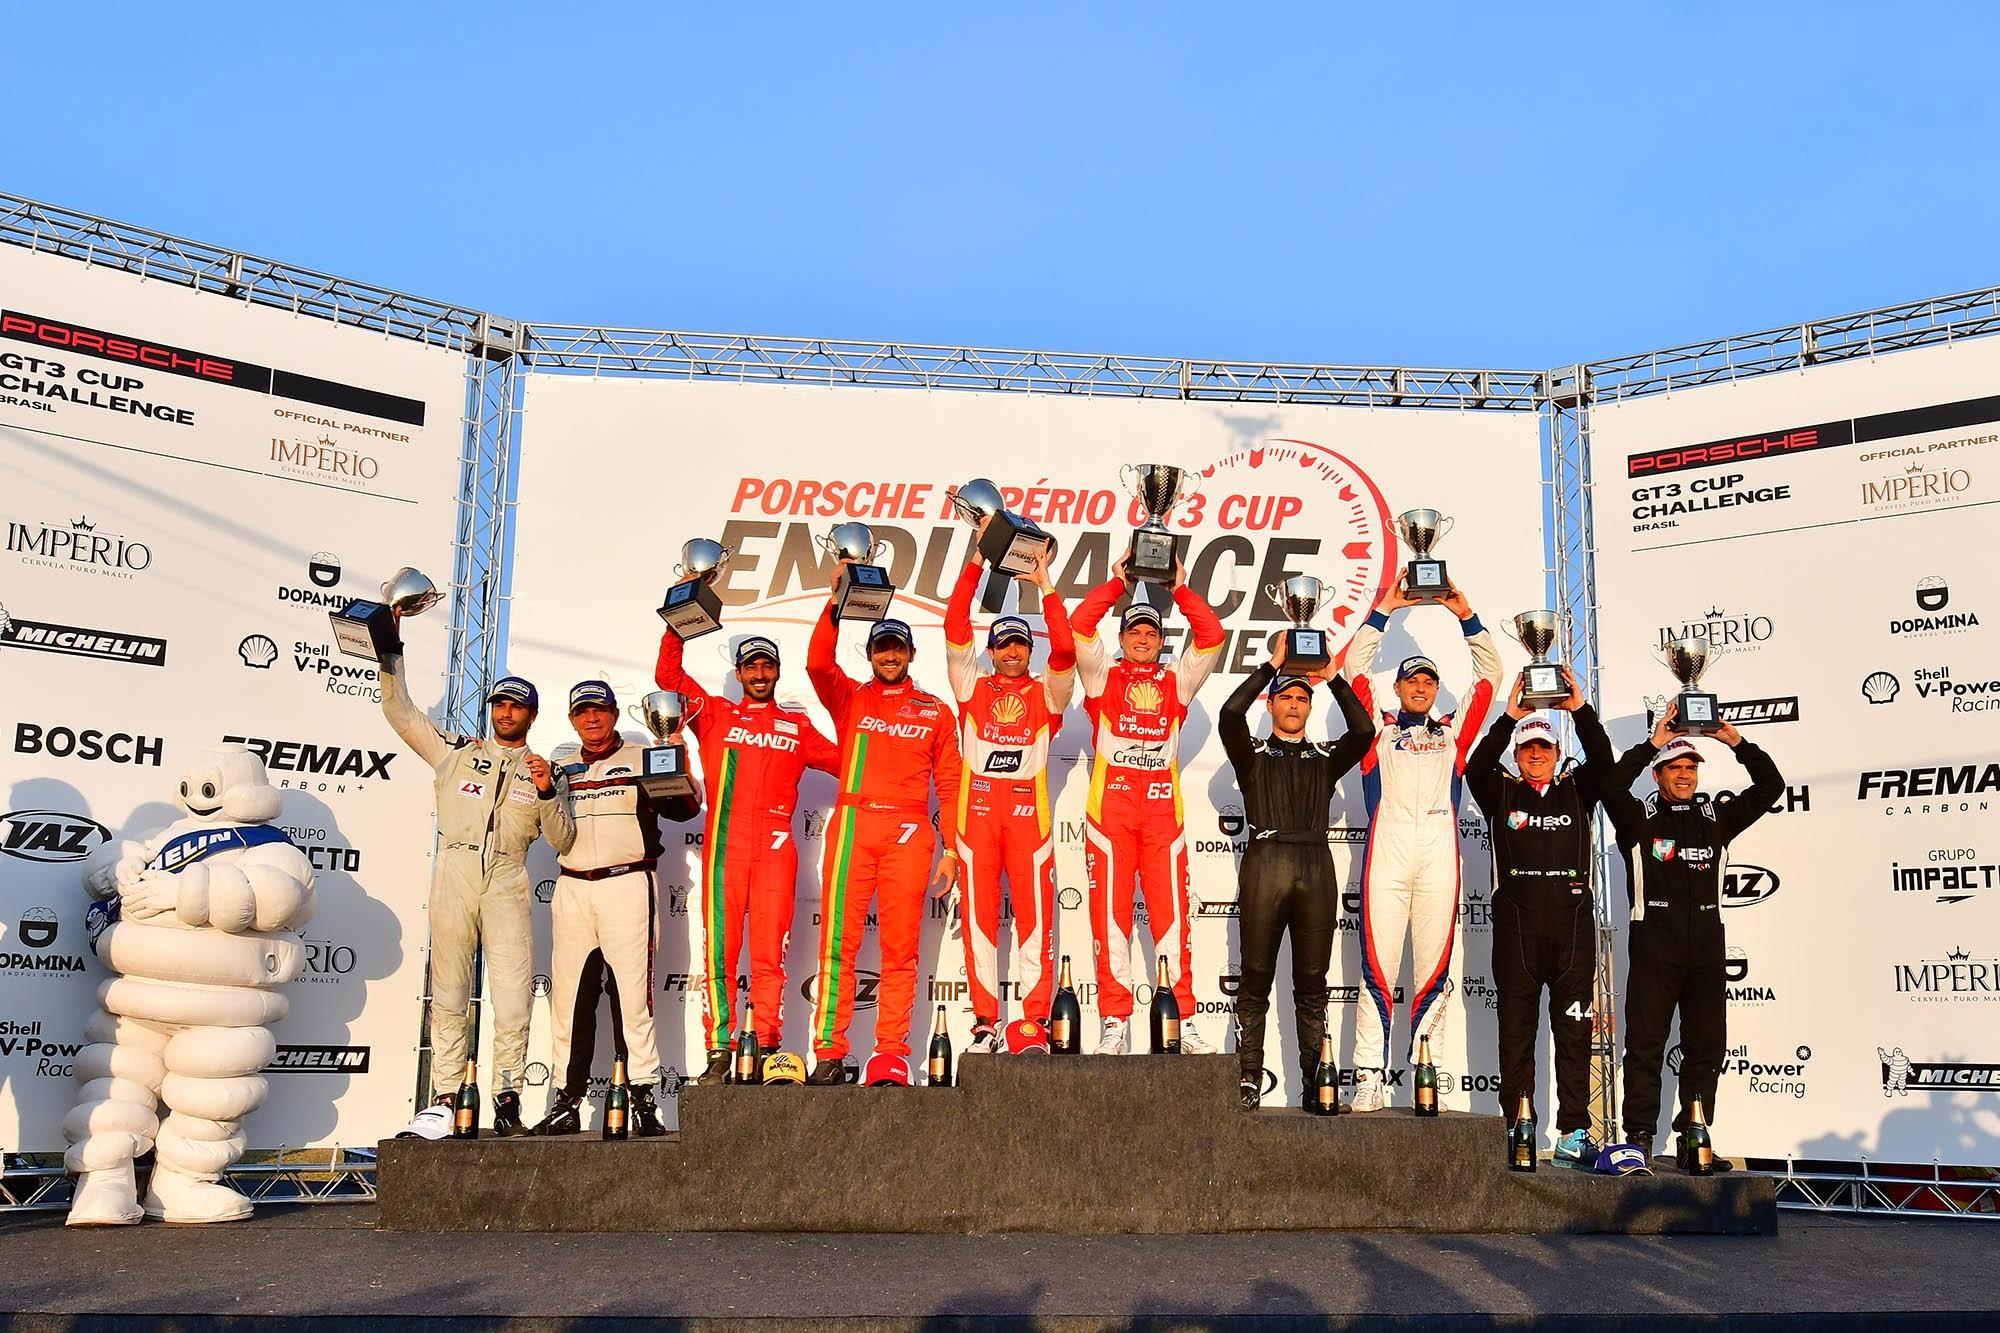 Pódio da categoria Cup e geral (Foto: Porsche Império GT3 Cup/Fernanda Freixosa )